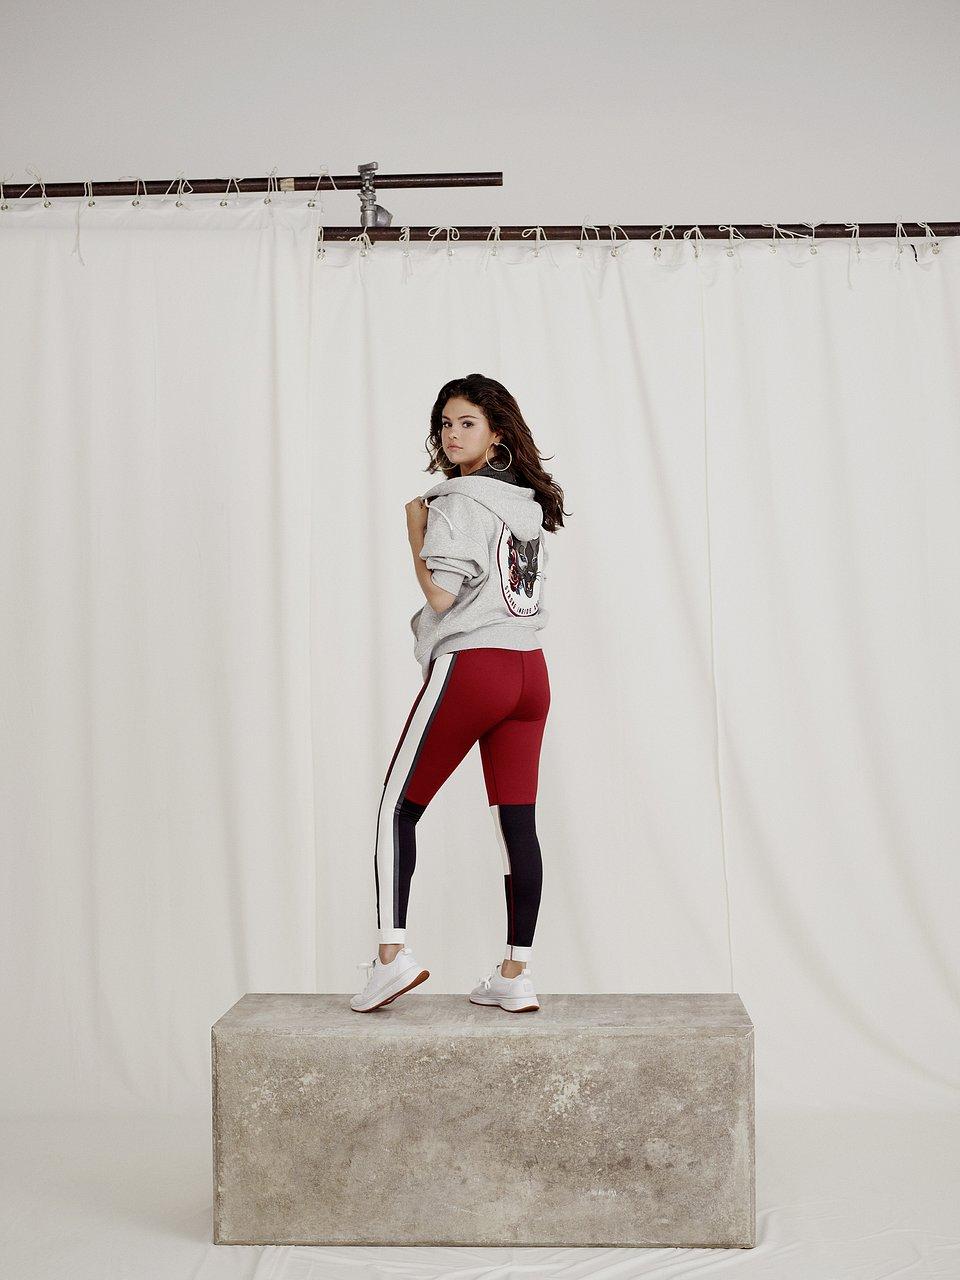 18AW_xRT_Selena-Collection_Selena-Gomez_Look-01_0073_RGB.jpg